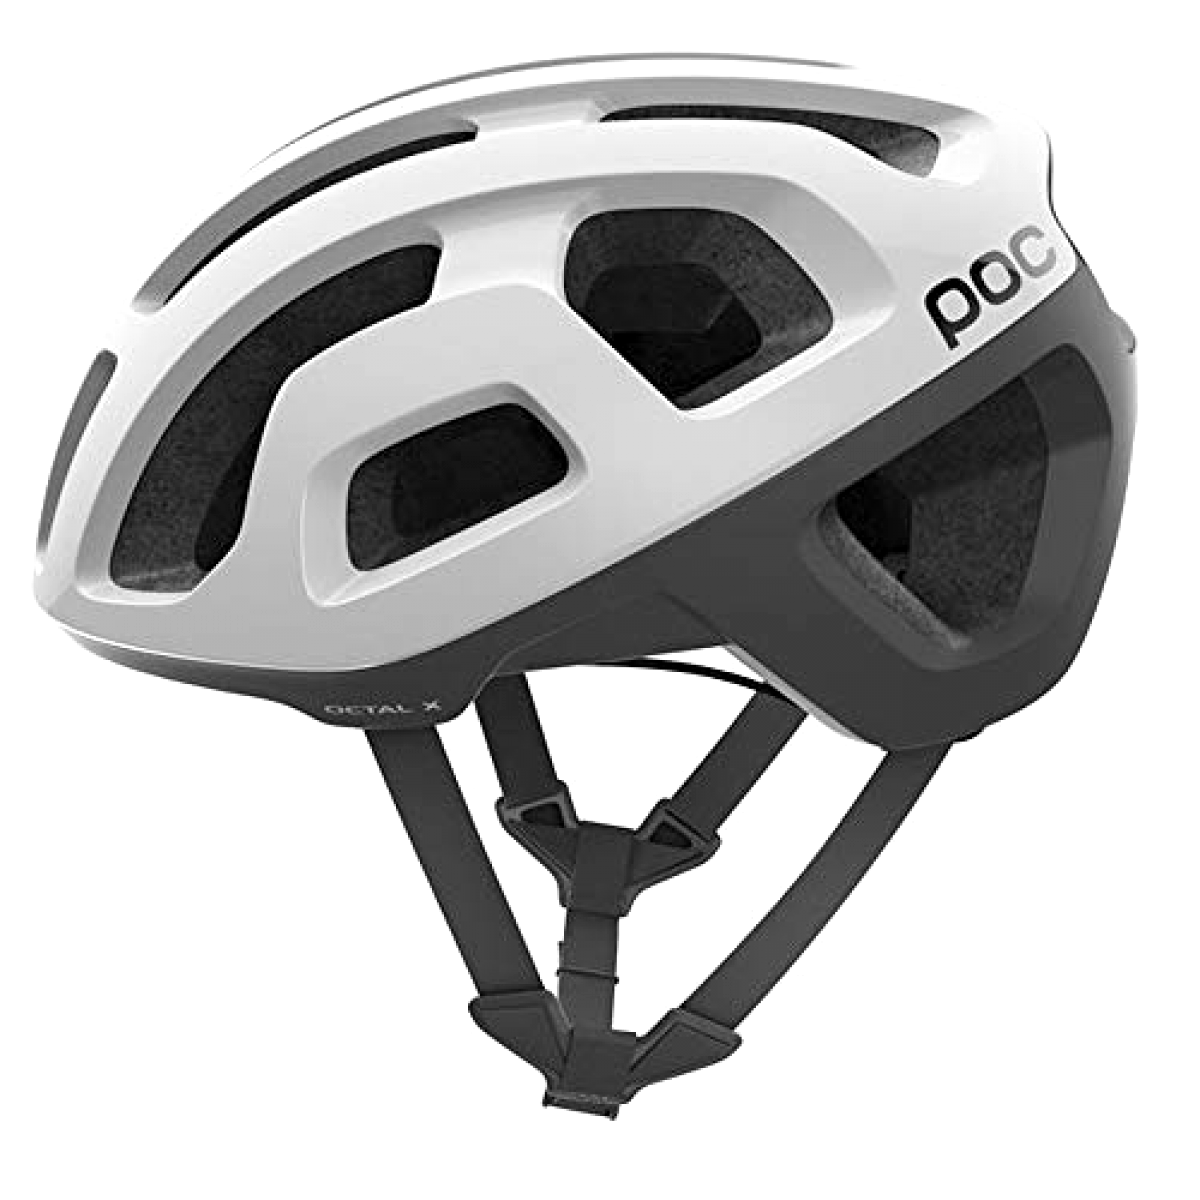 POC Octal X, Helmet for Mountain Biking, Hydrogen blanc, Medium, New